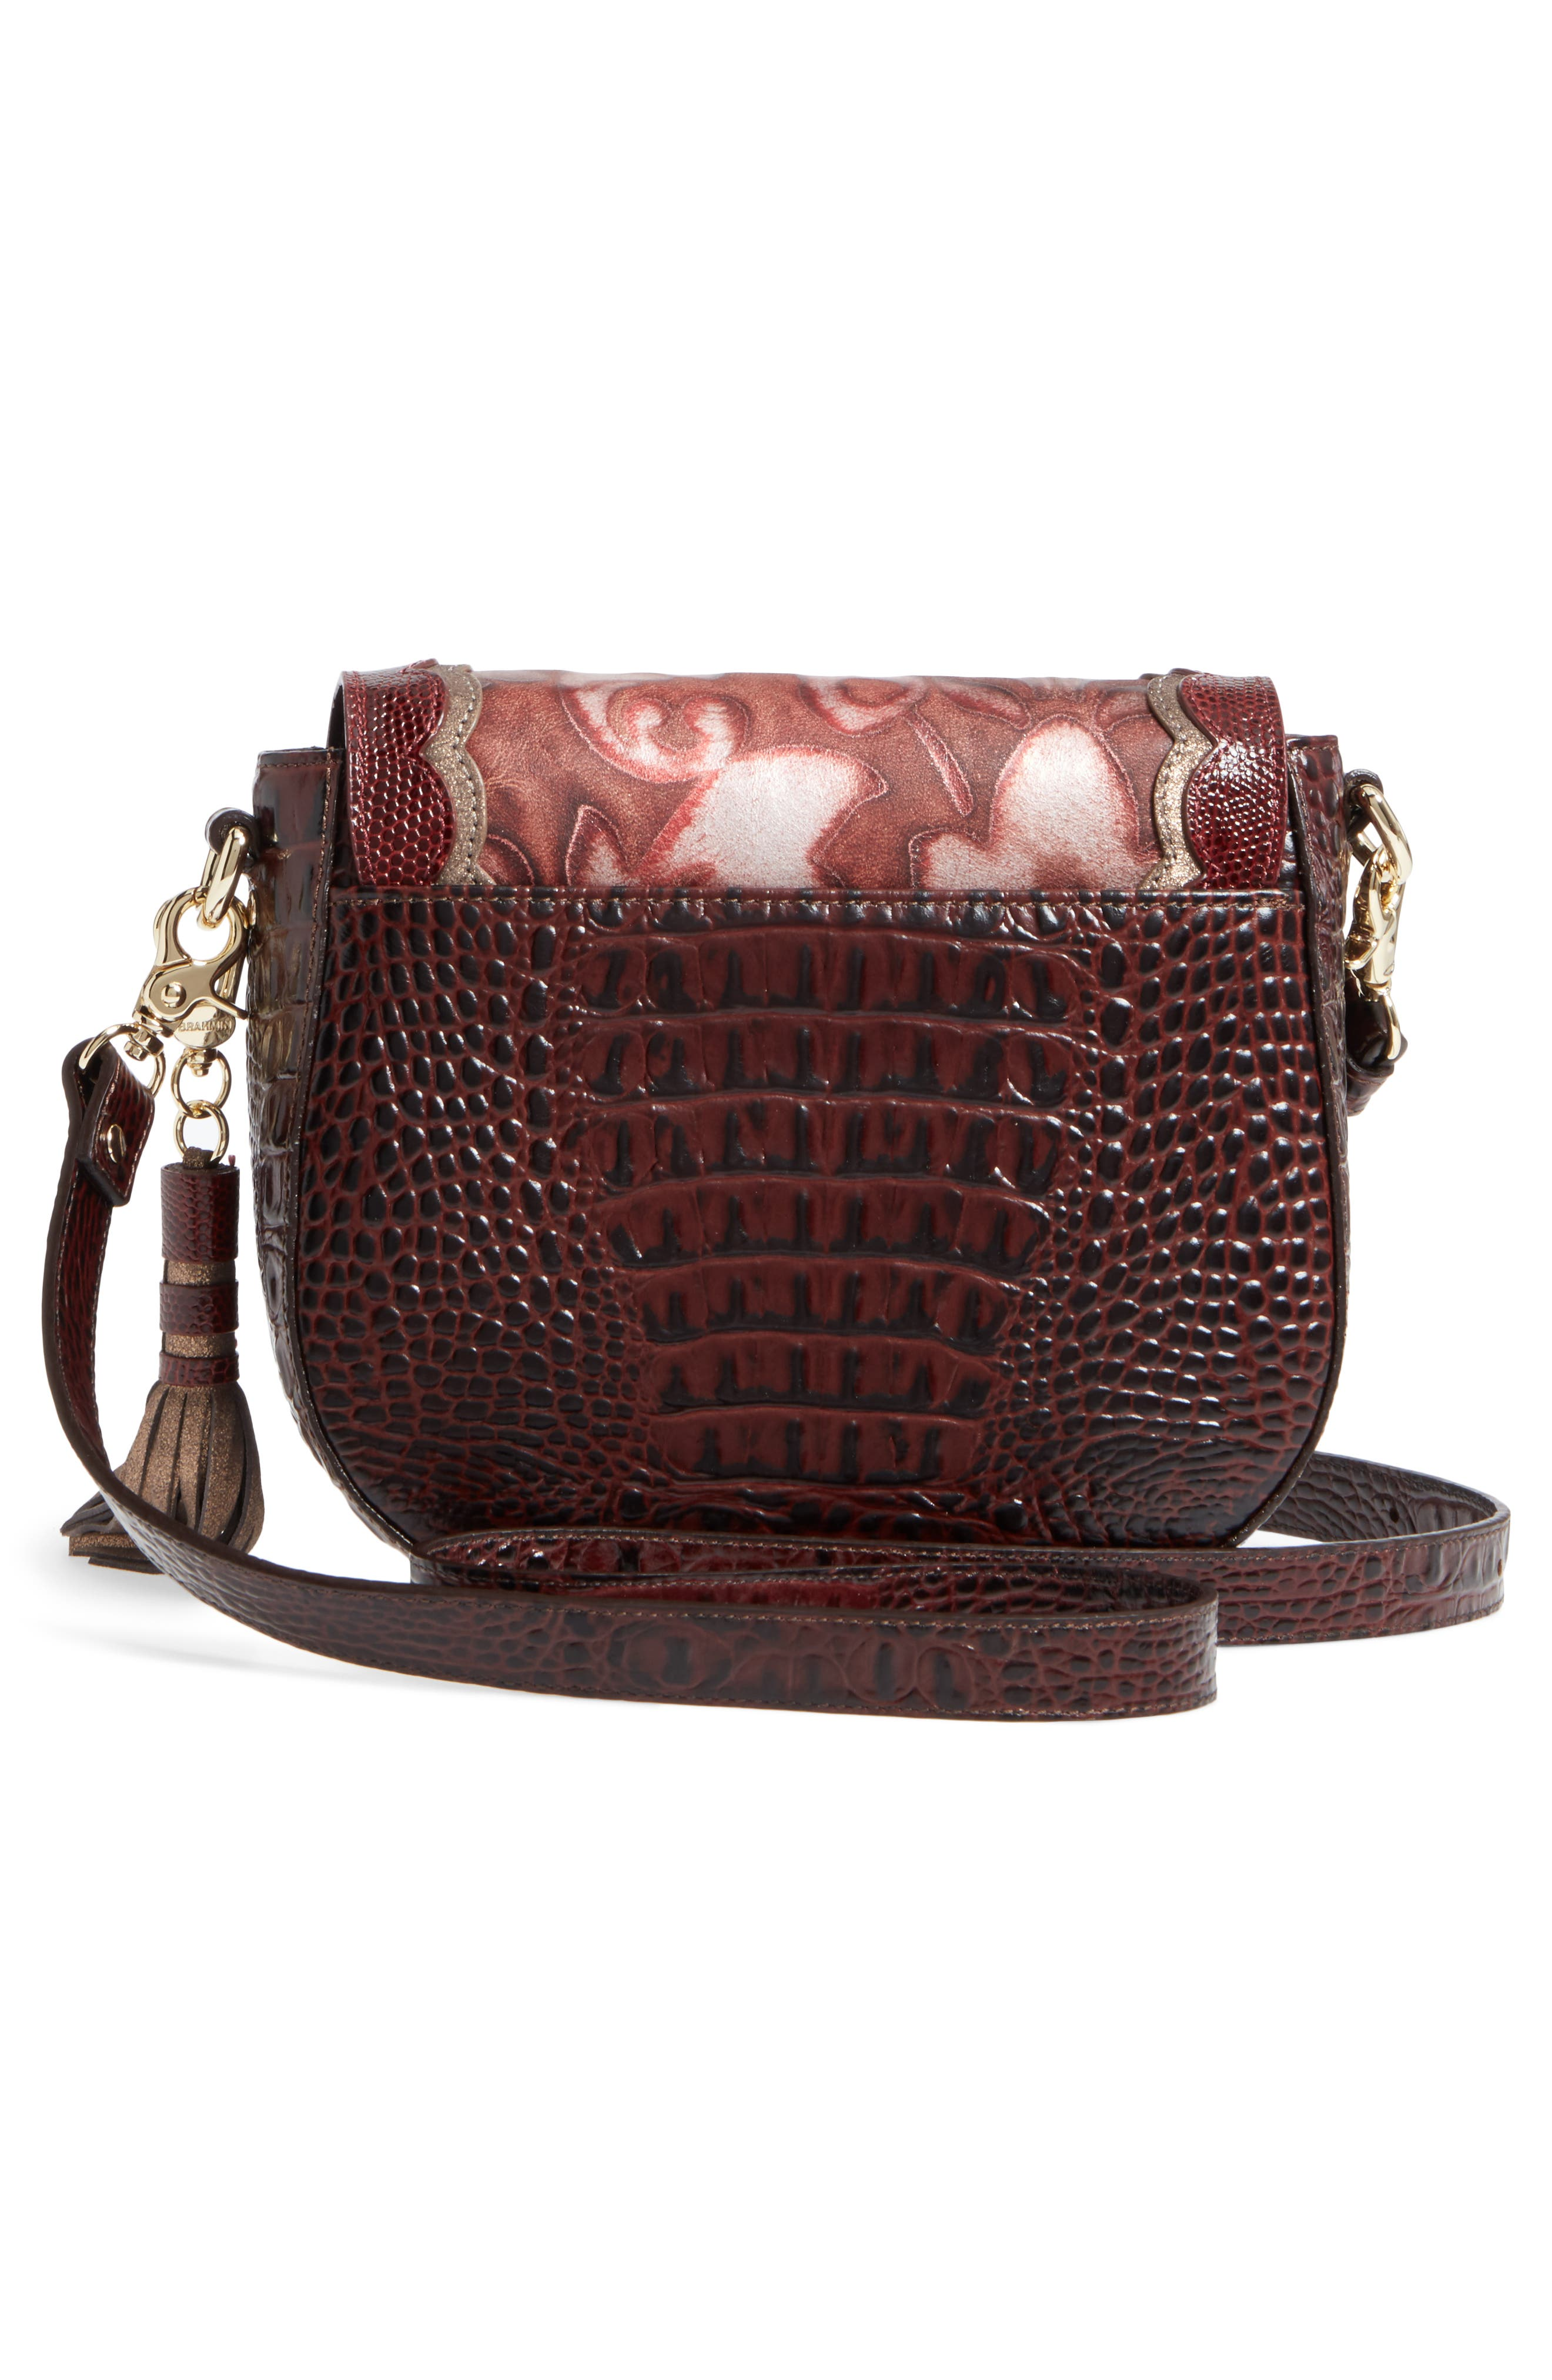 Verona Mini Sonny Leather Crossbody Bag,                             Alternate thumbnail 3, color,                             Red